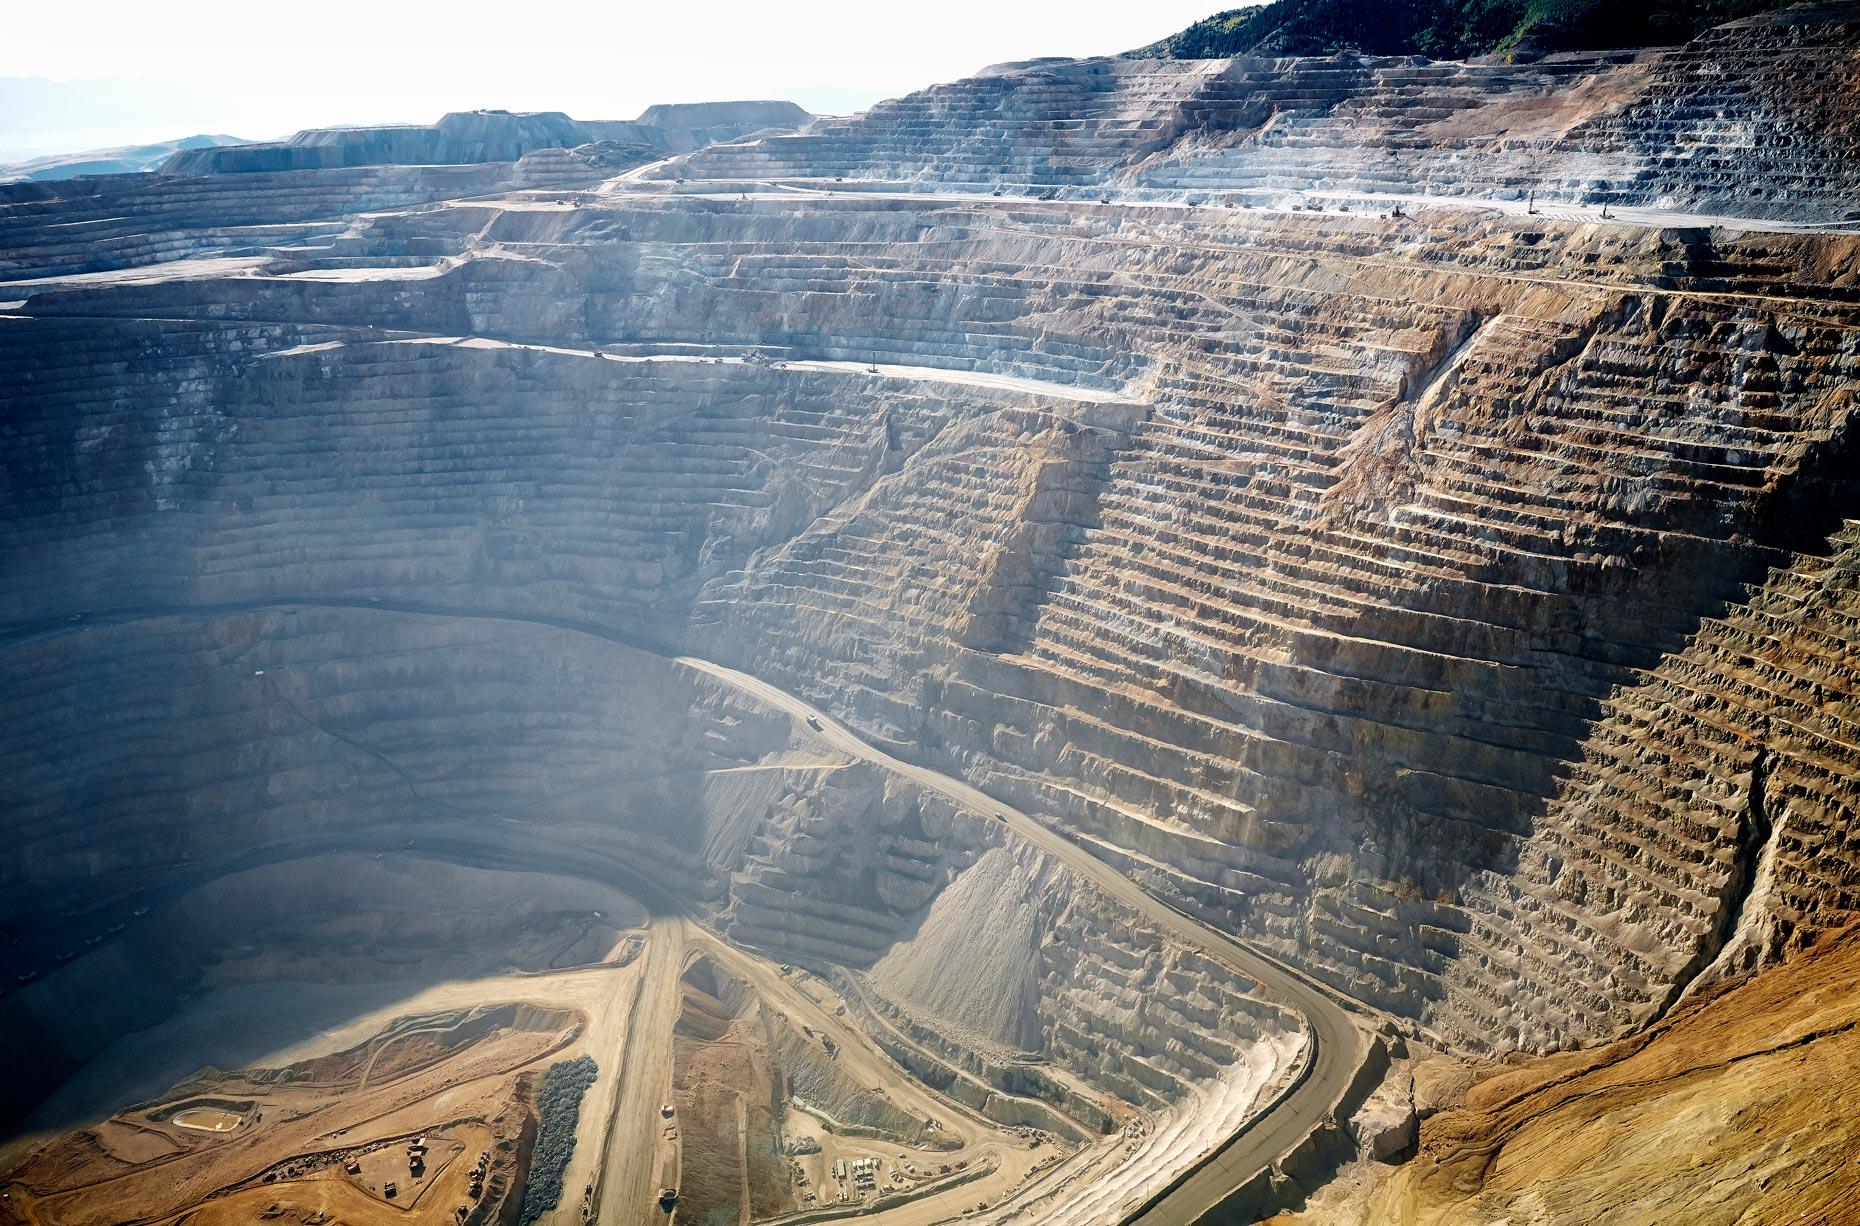 Travel Photography Derek Israelsen 014 Kennecott Copper Mines